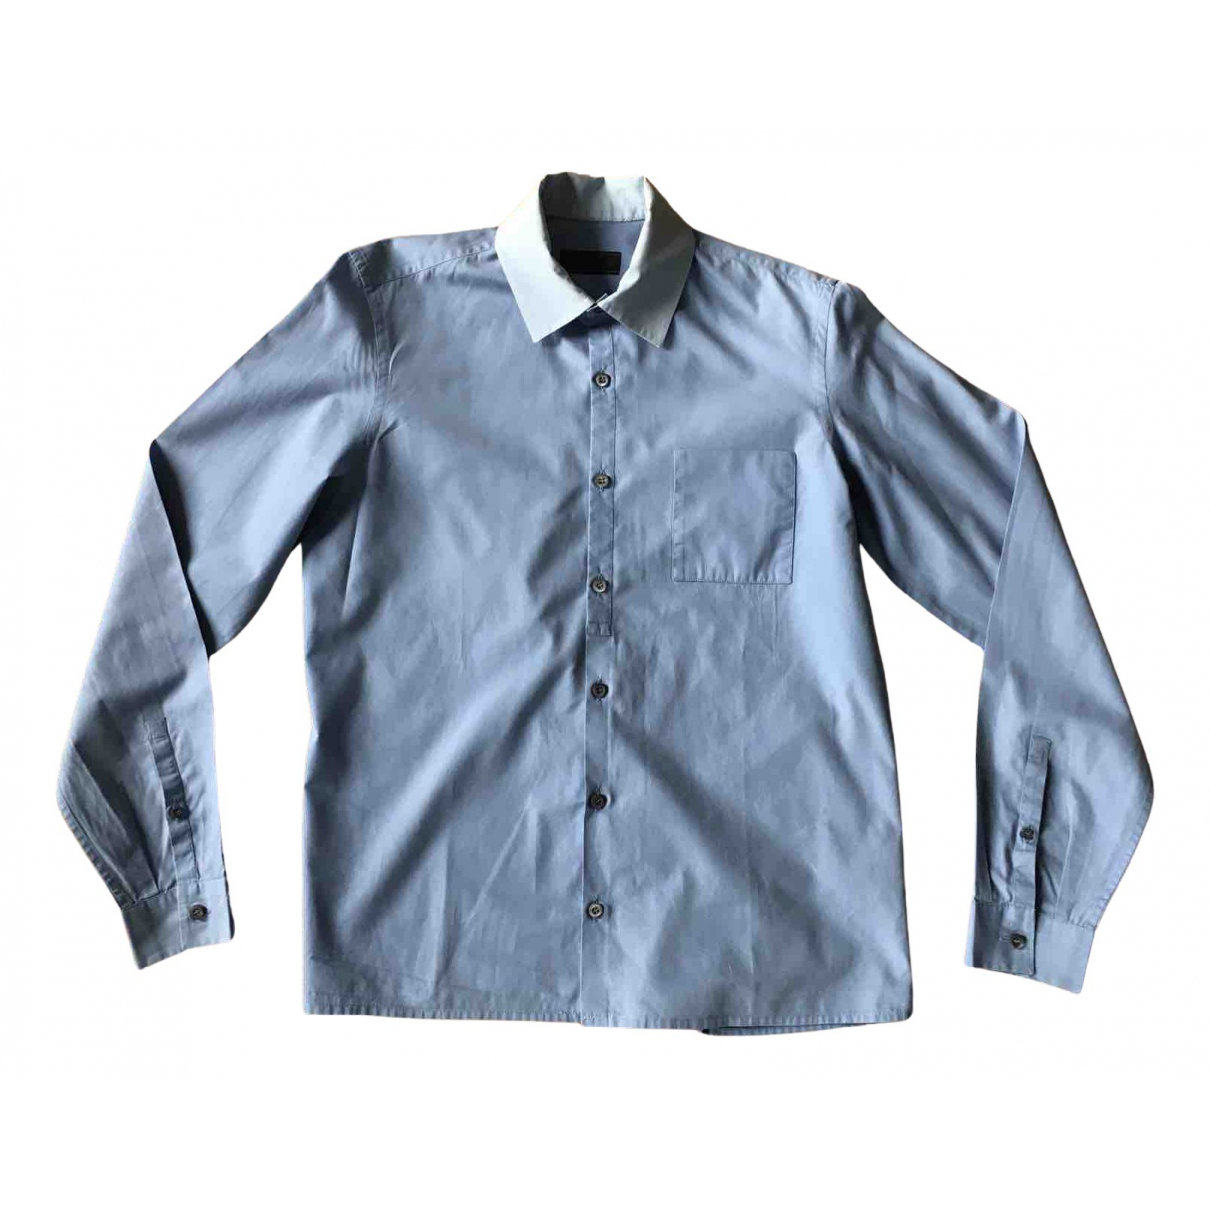 Prada N Blue Cotton Shirts for Men 39 EU (tour de cou / collar)